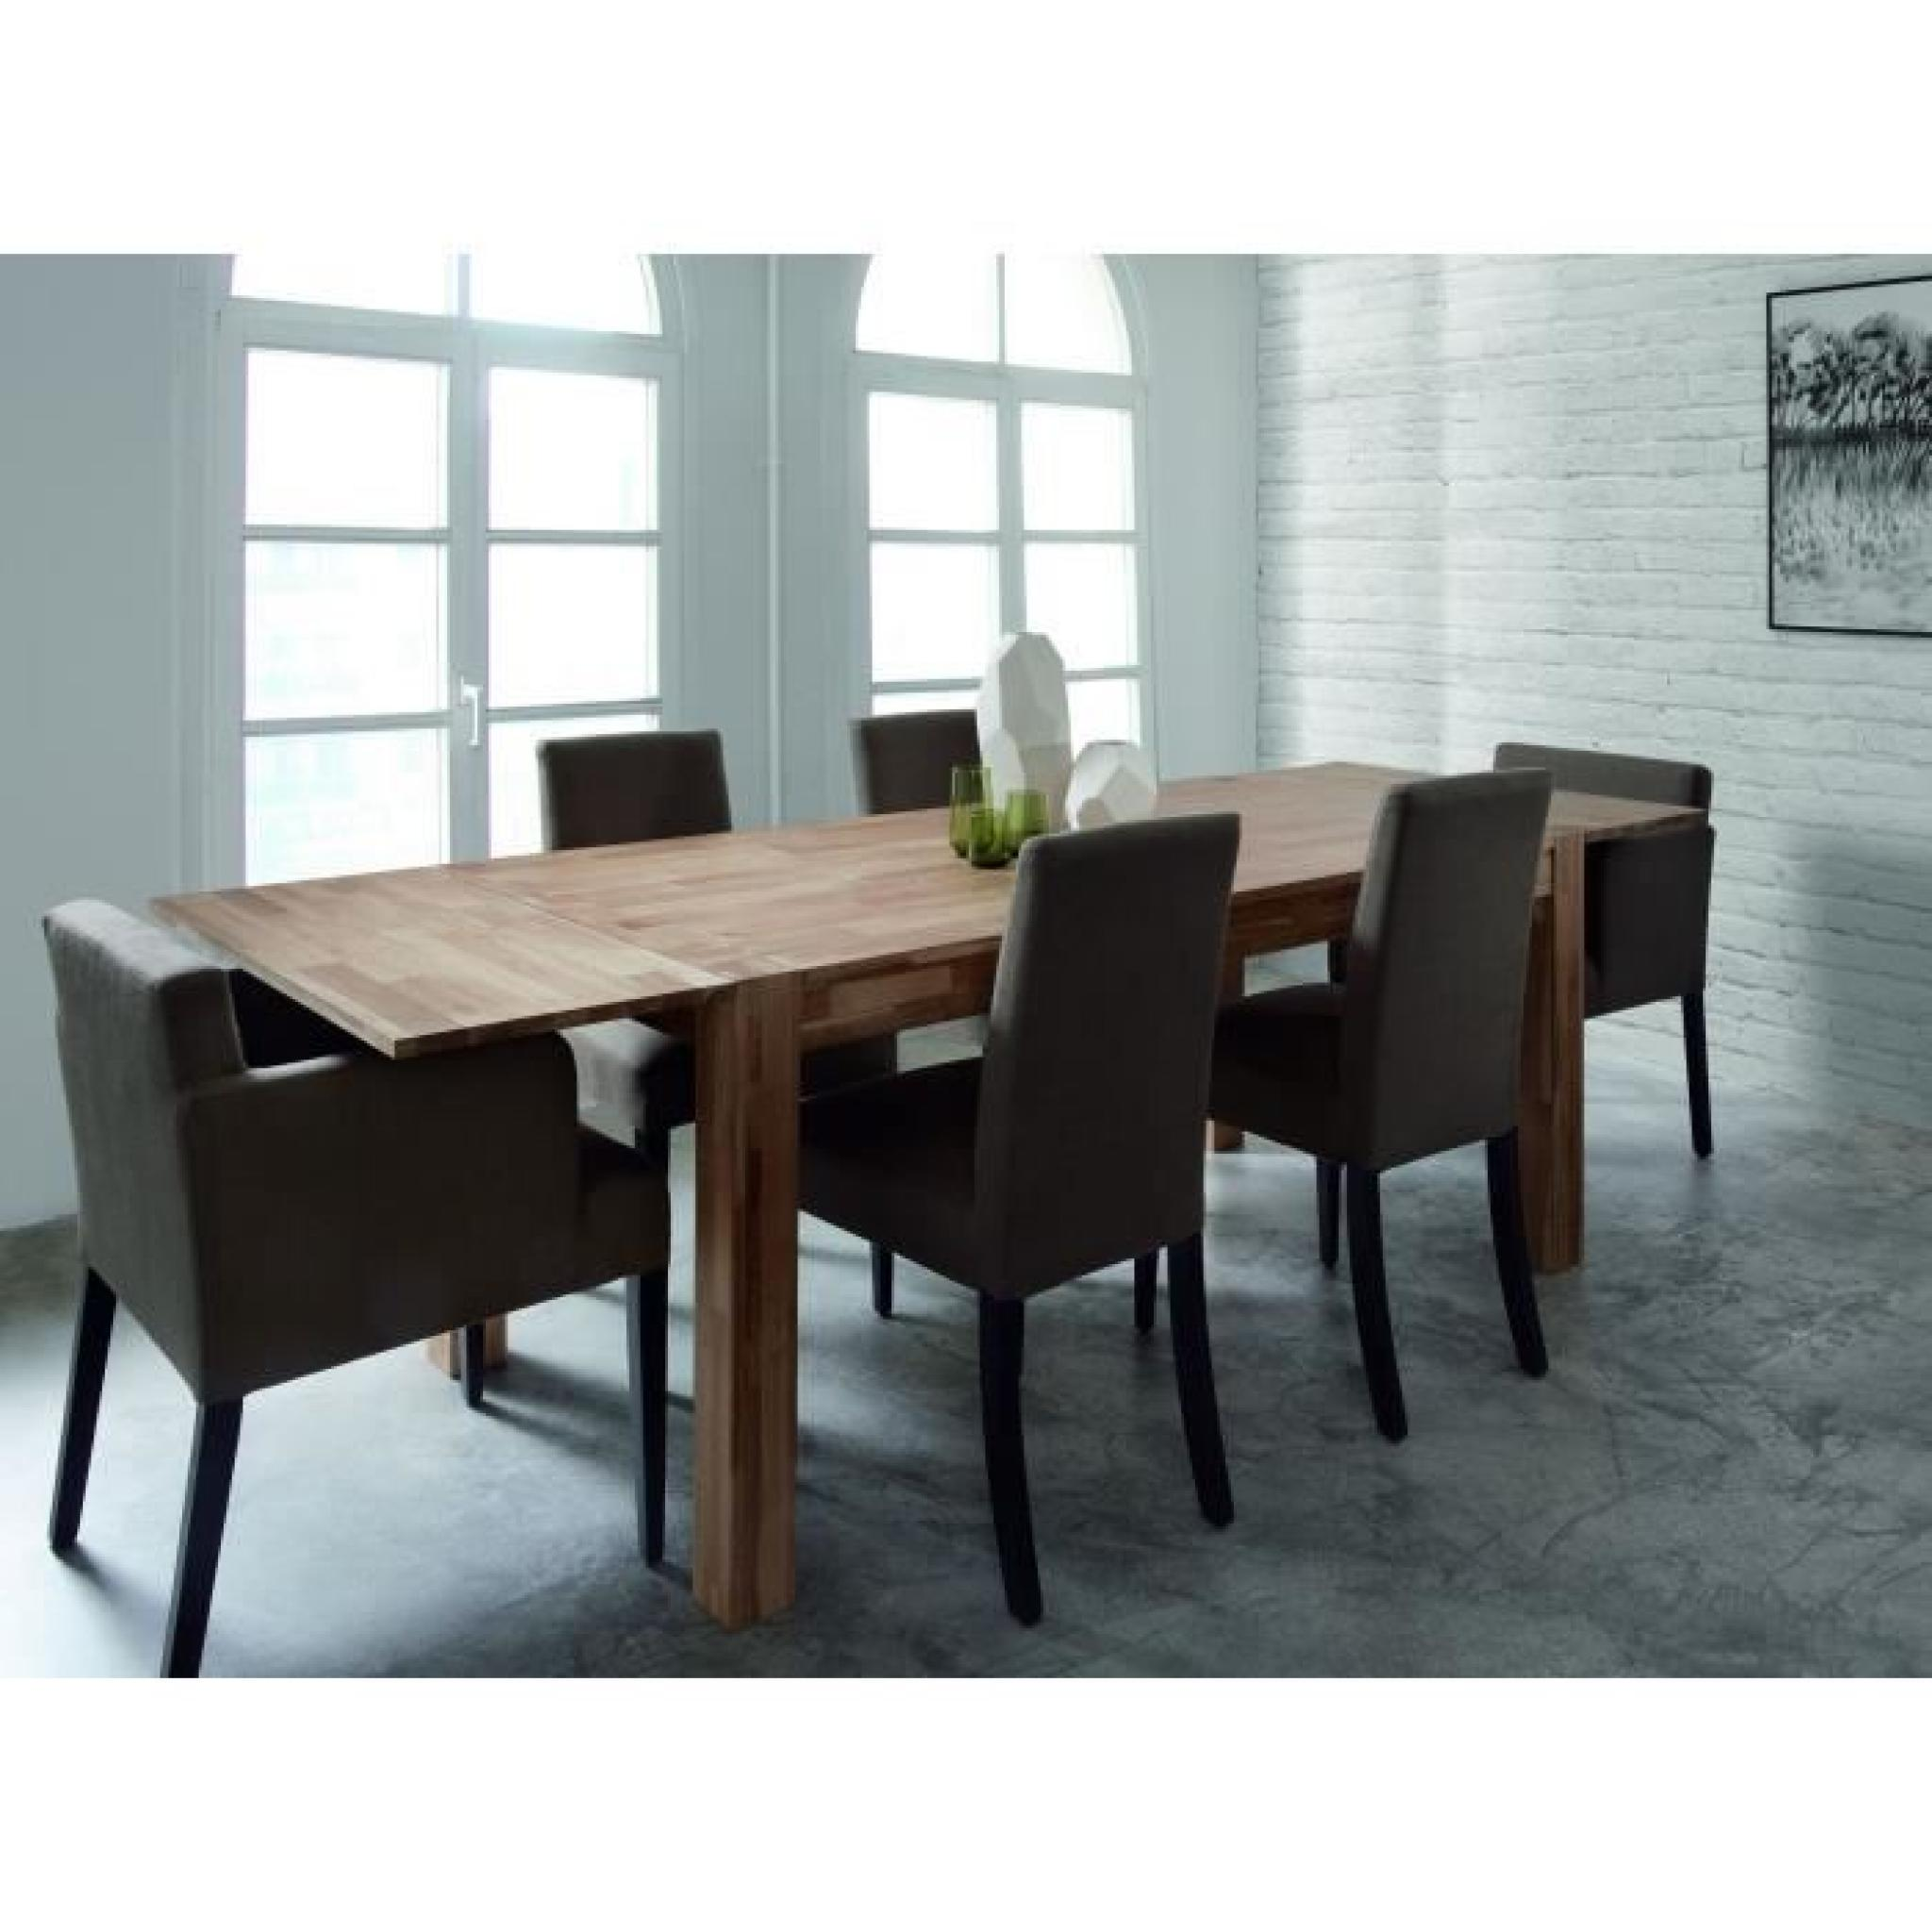 #5D4B3C MILES Table Extensible Chêne Massif 150/230cm Achat  5103 salle a manger chene massif pas cher 2048x2048 px @ aertt.com